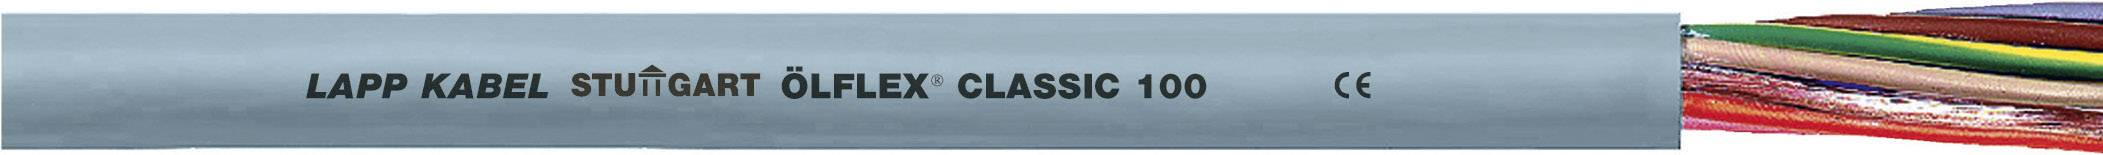 Kabel LappKabel Ölflex CLASSIC 100 3X1,5 (00101284), PVC, 6,7 mm, 500 V, šedá, 500 m